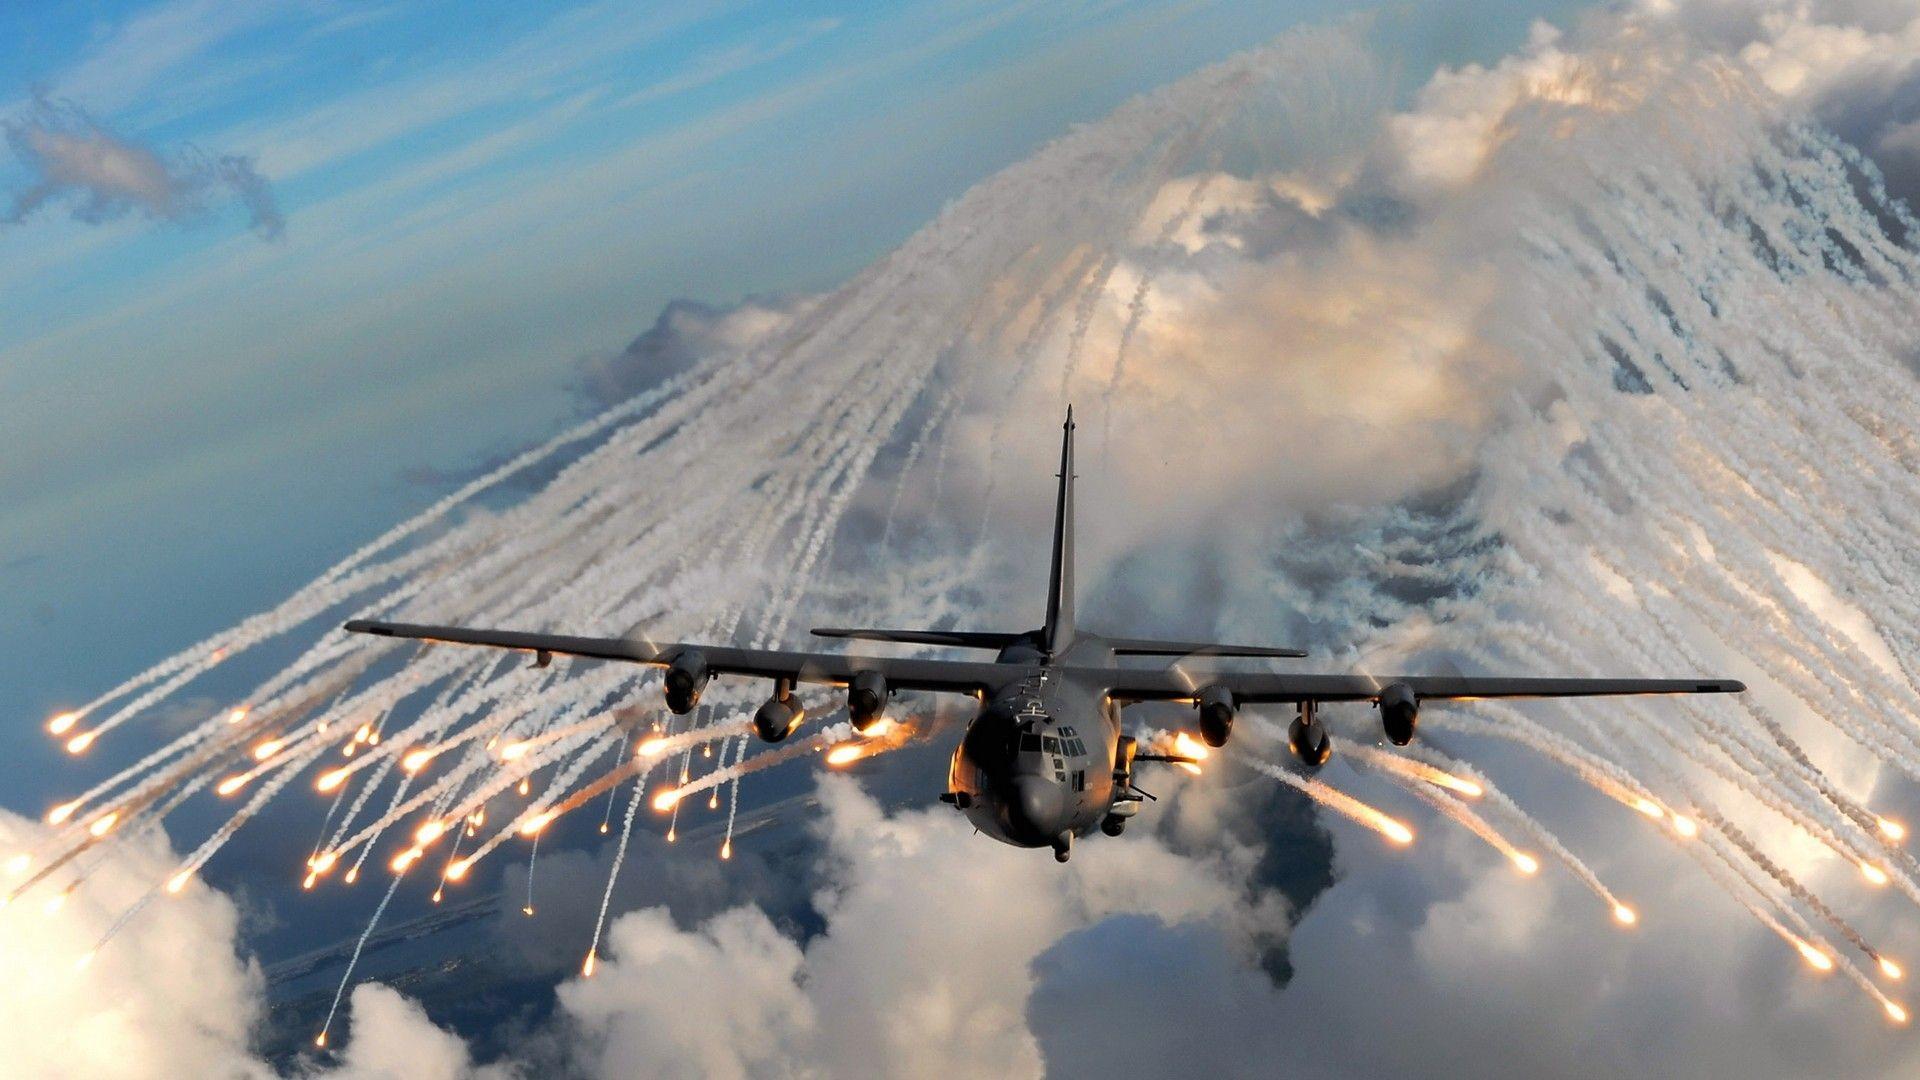 General 1920x1080 aircraft Lockheed C-130 Hercules military aircraft military vehicle